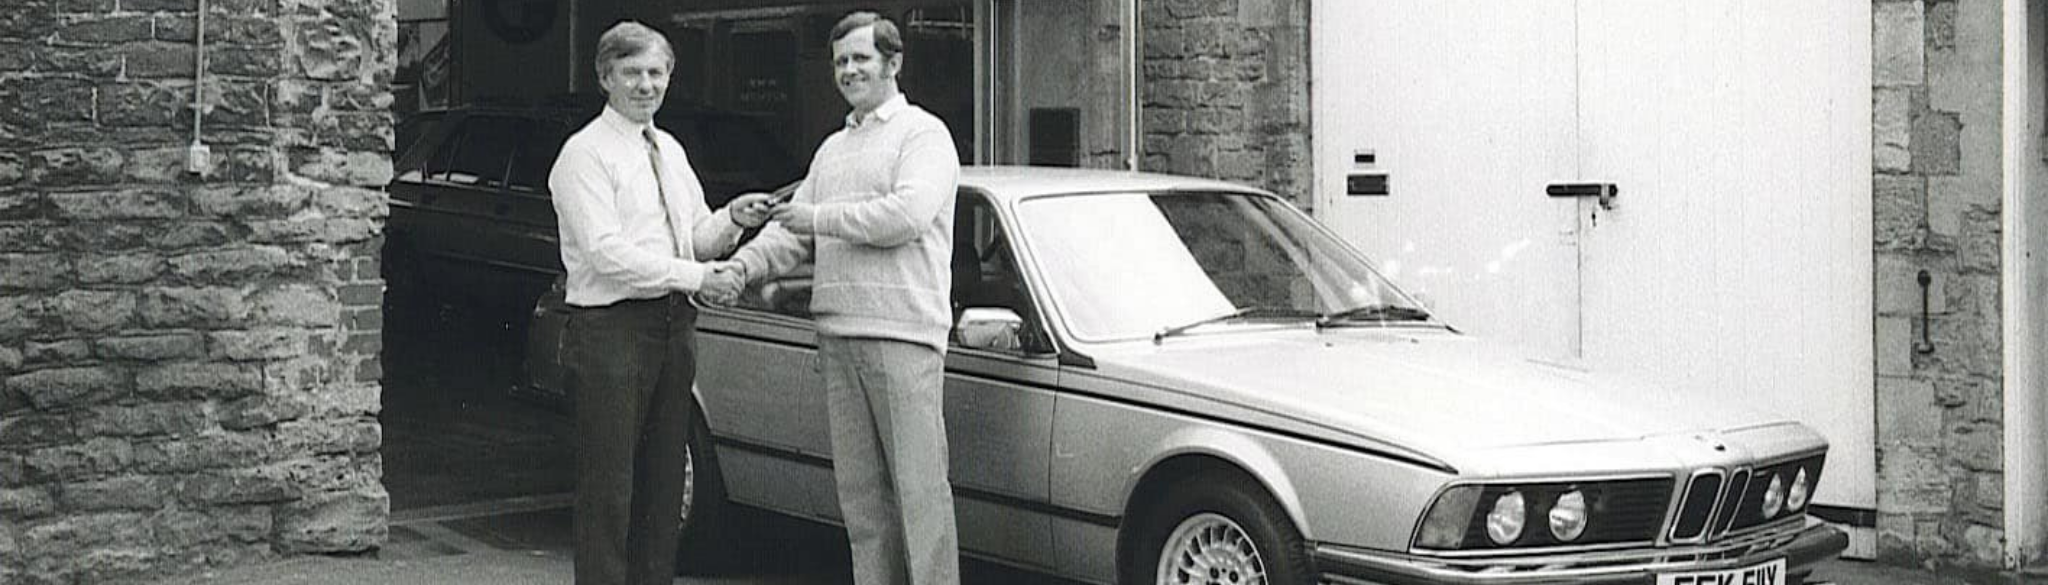 Dick Lovett BMW